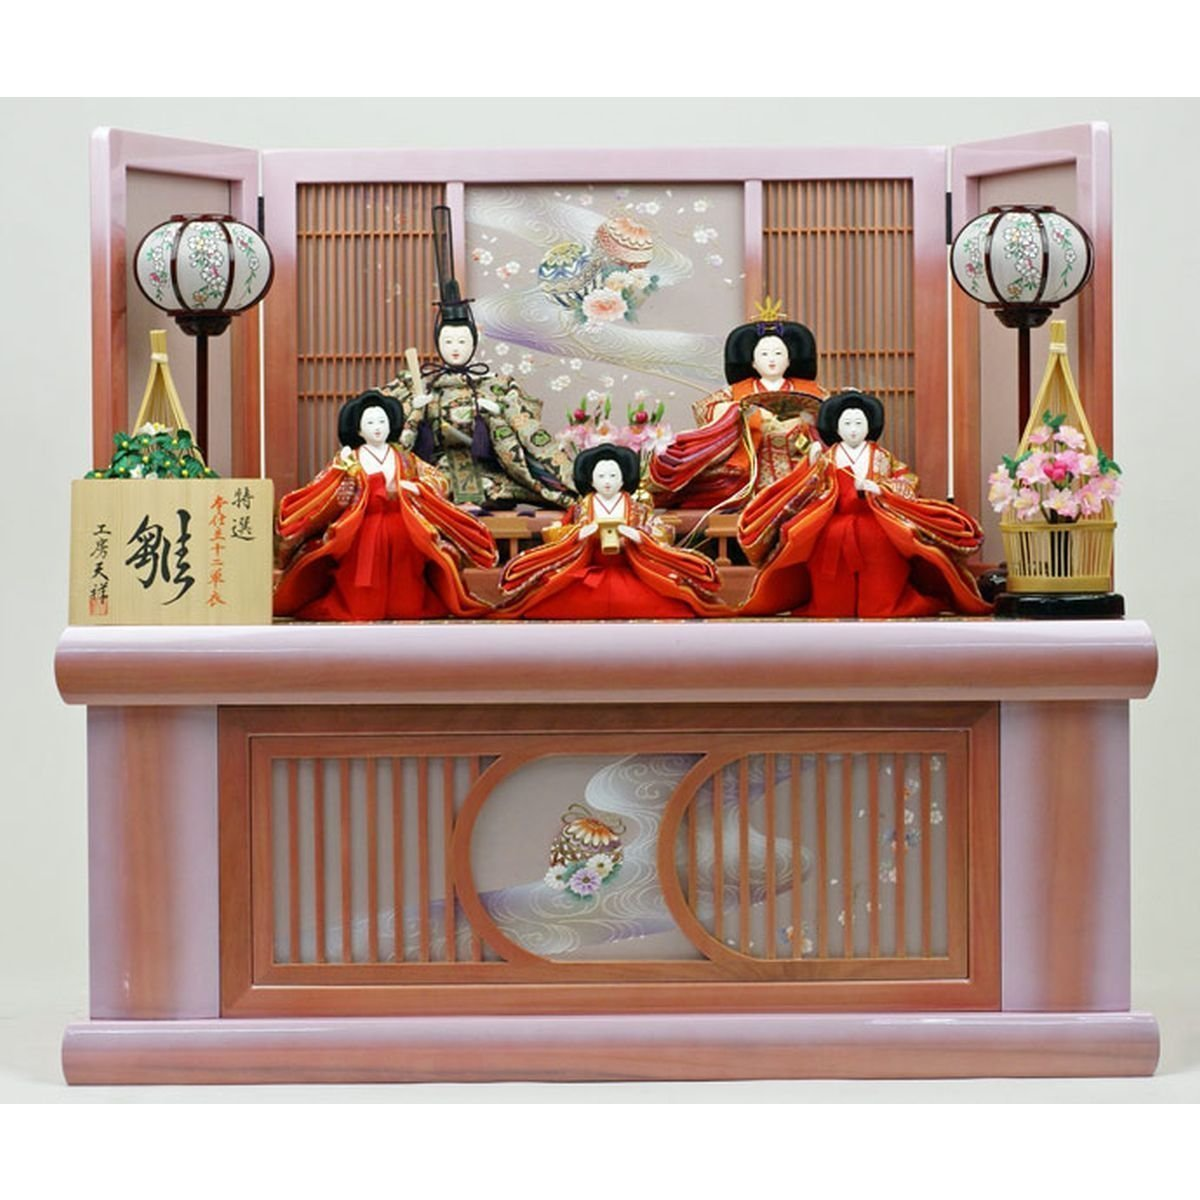 人形工房天祥 雛人形 収納飾り 五人飾り 衣装着 十二単 間口70×奥行40×高さ62.5(cm) 12bi-momoka-a   B00ARBKKFW